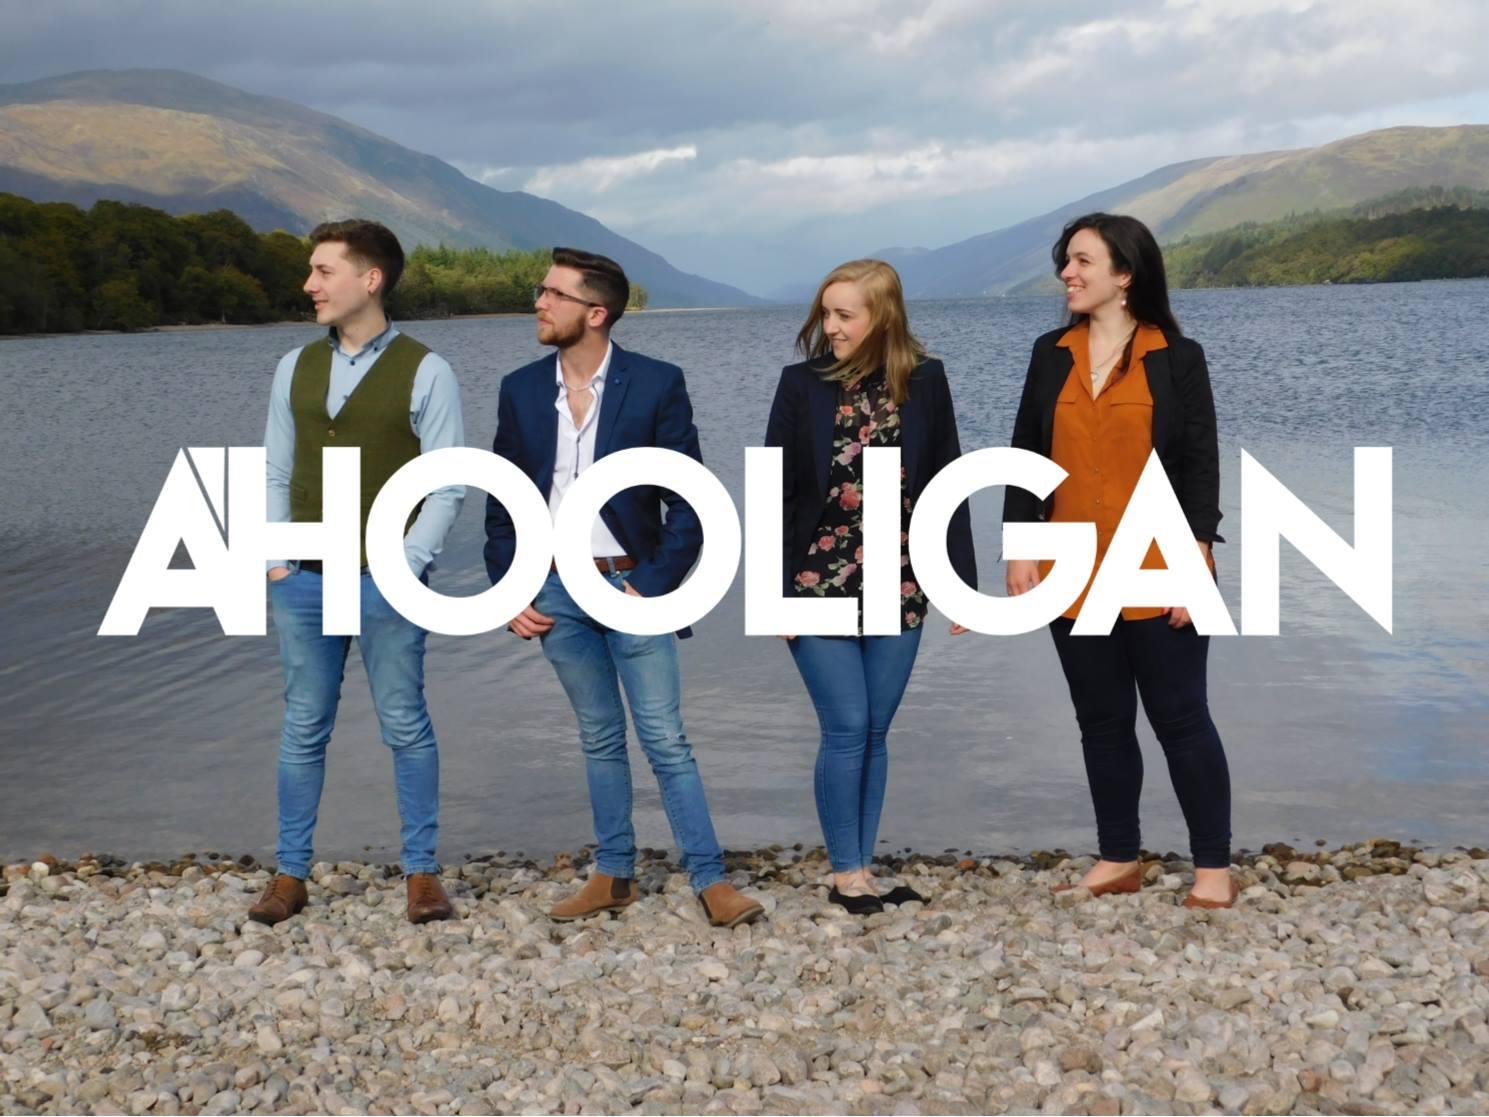 A'Hooligan